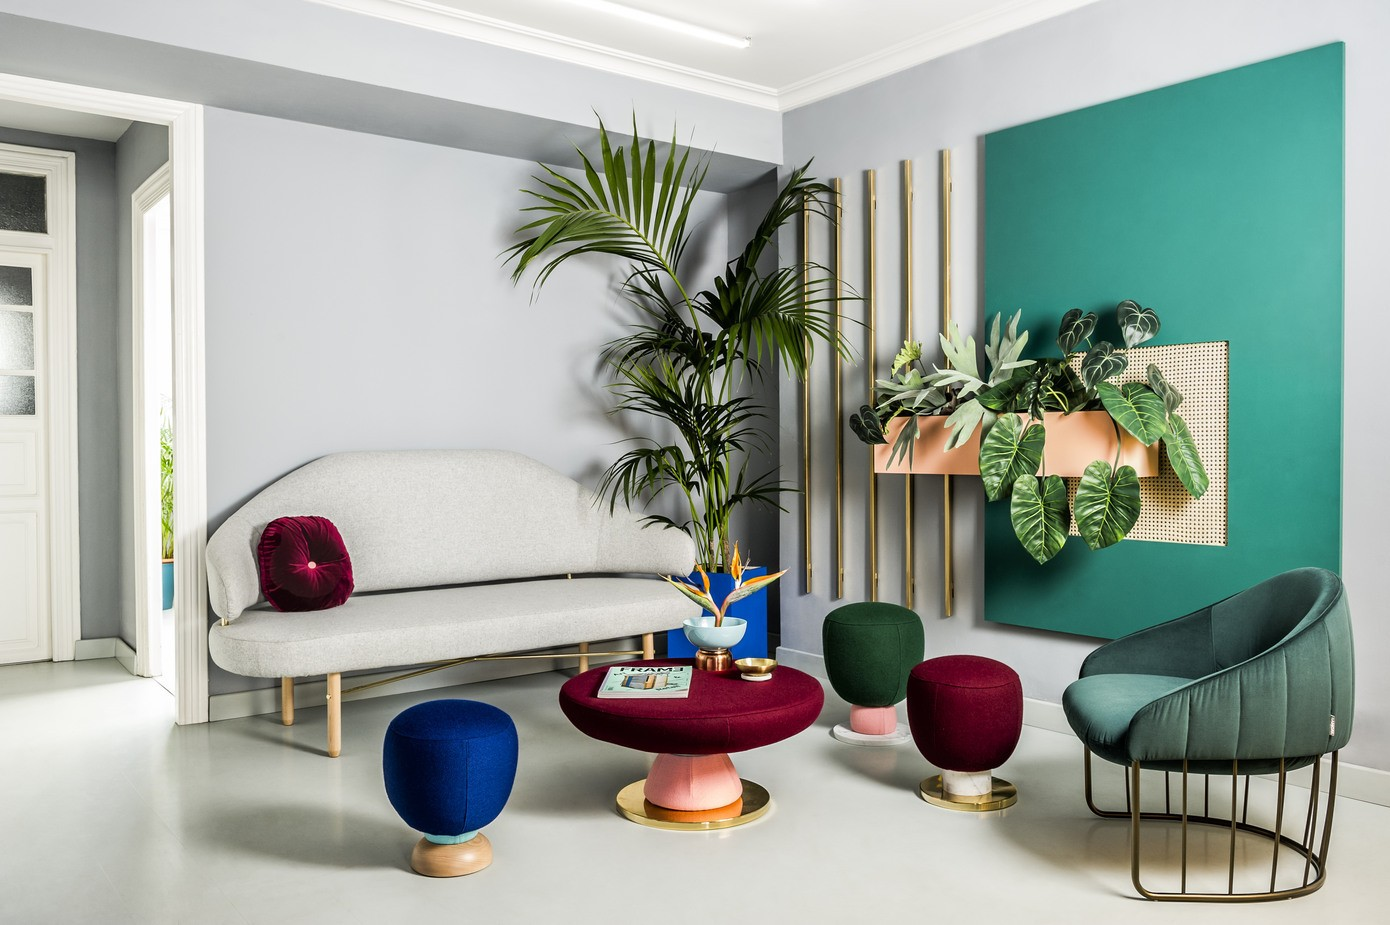 Studio in valencia by masquespacio interior design homeadore for Studio interior design brescia